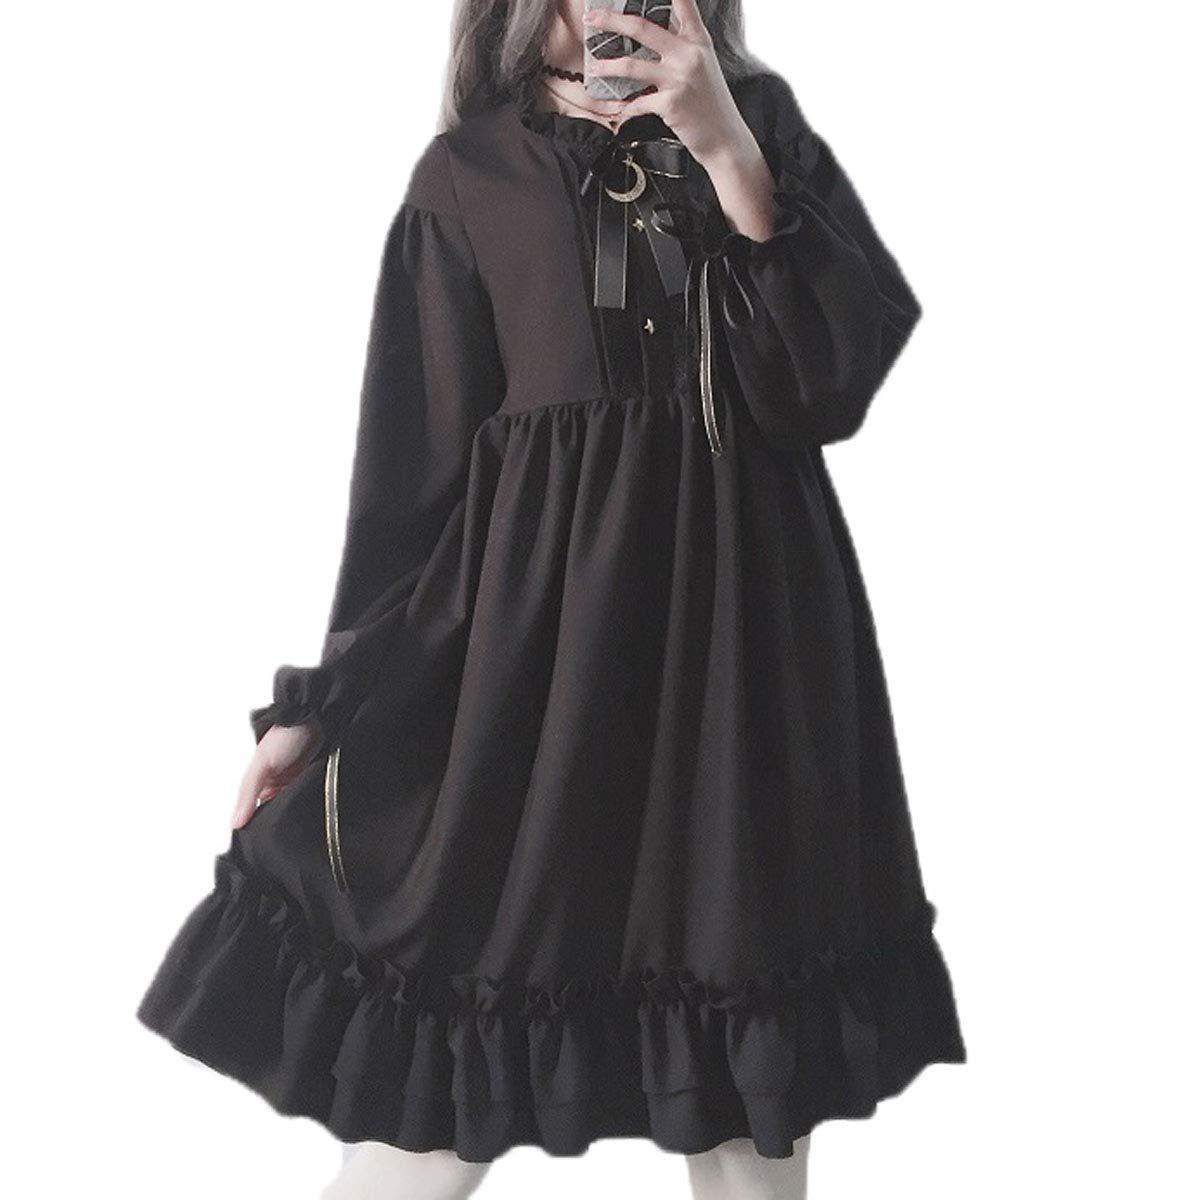 8411dc0f15109 Packitcute Long Sleeve Dress Teen Girls Japanese Gothic Lolita Dress